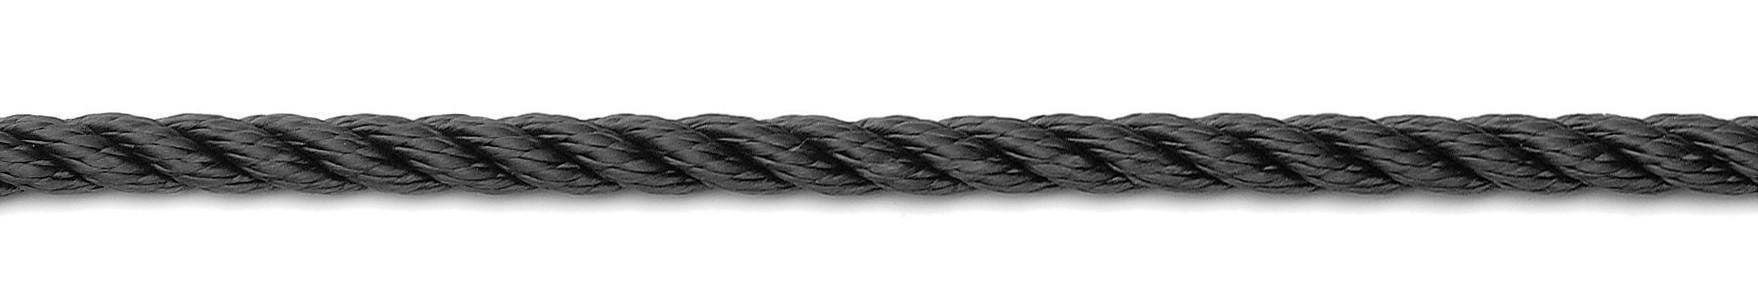 Landvast 3-strengs PPM zwart U-Rope